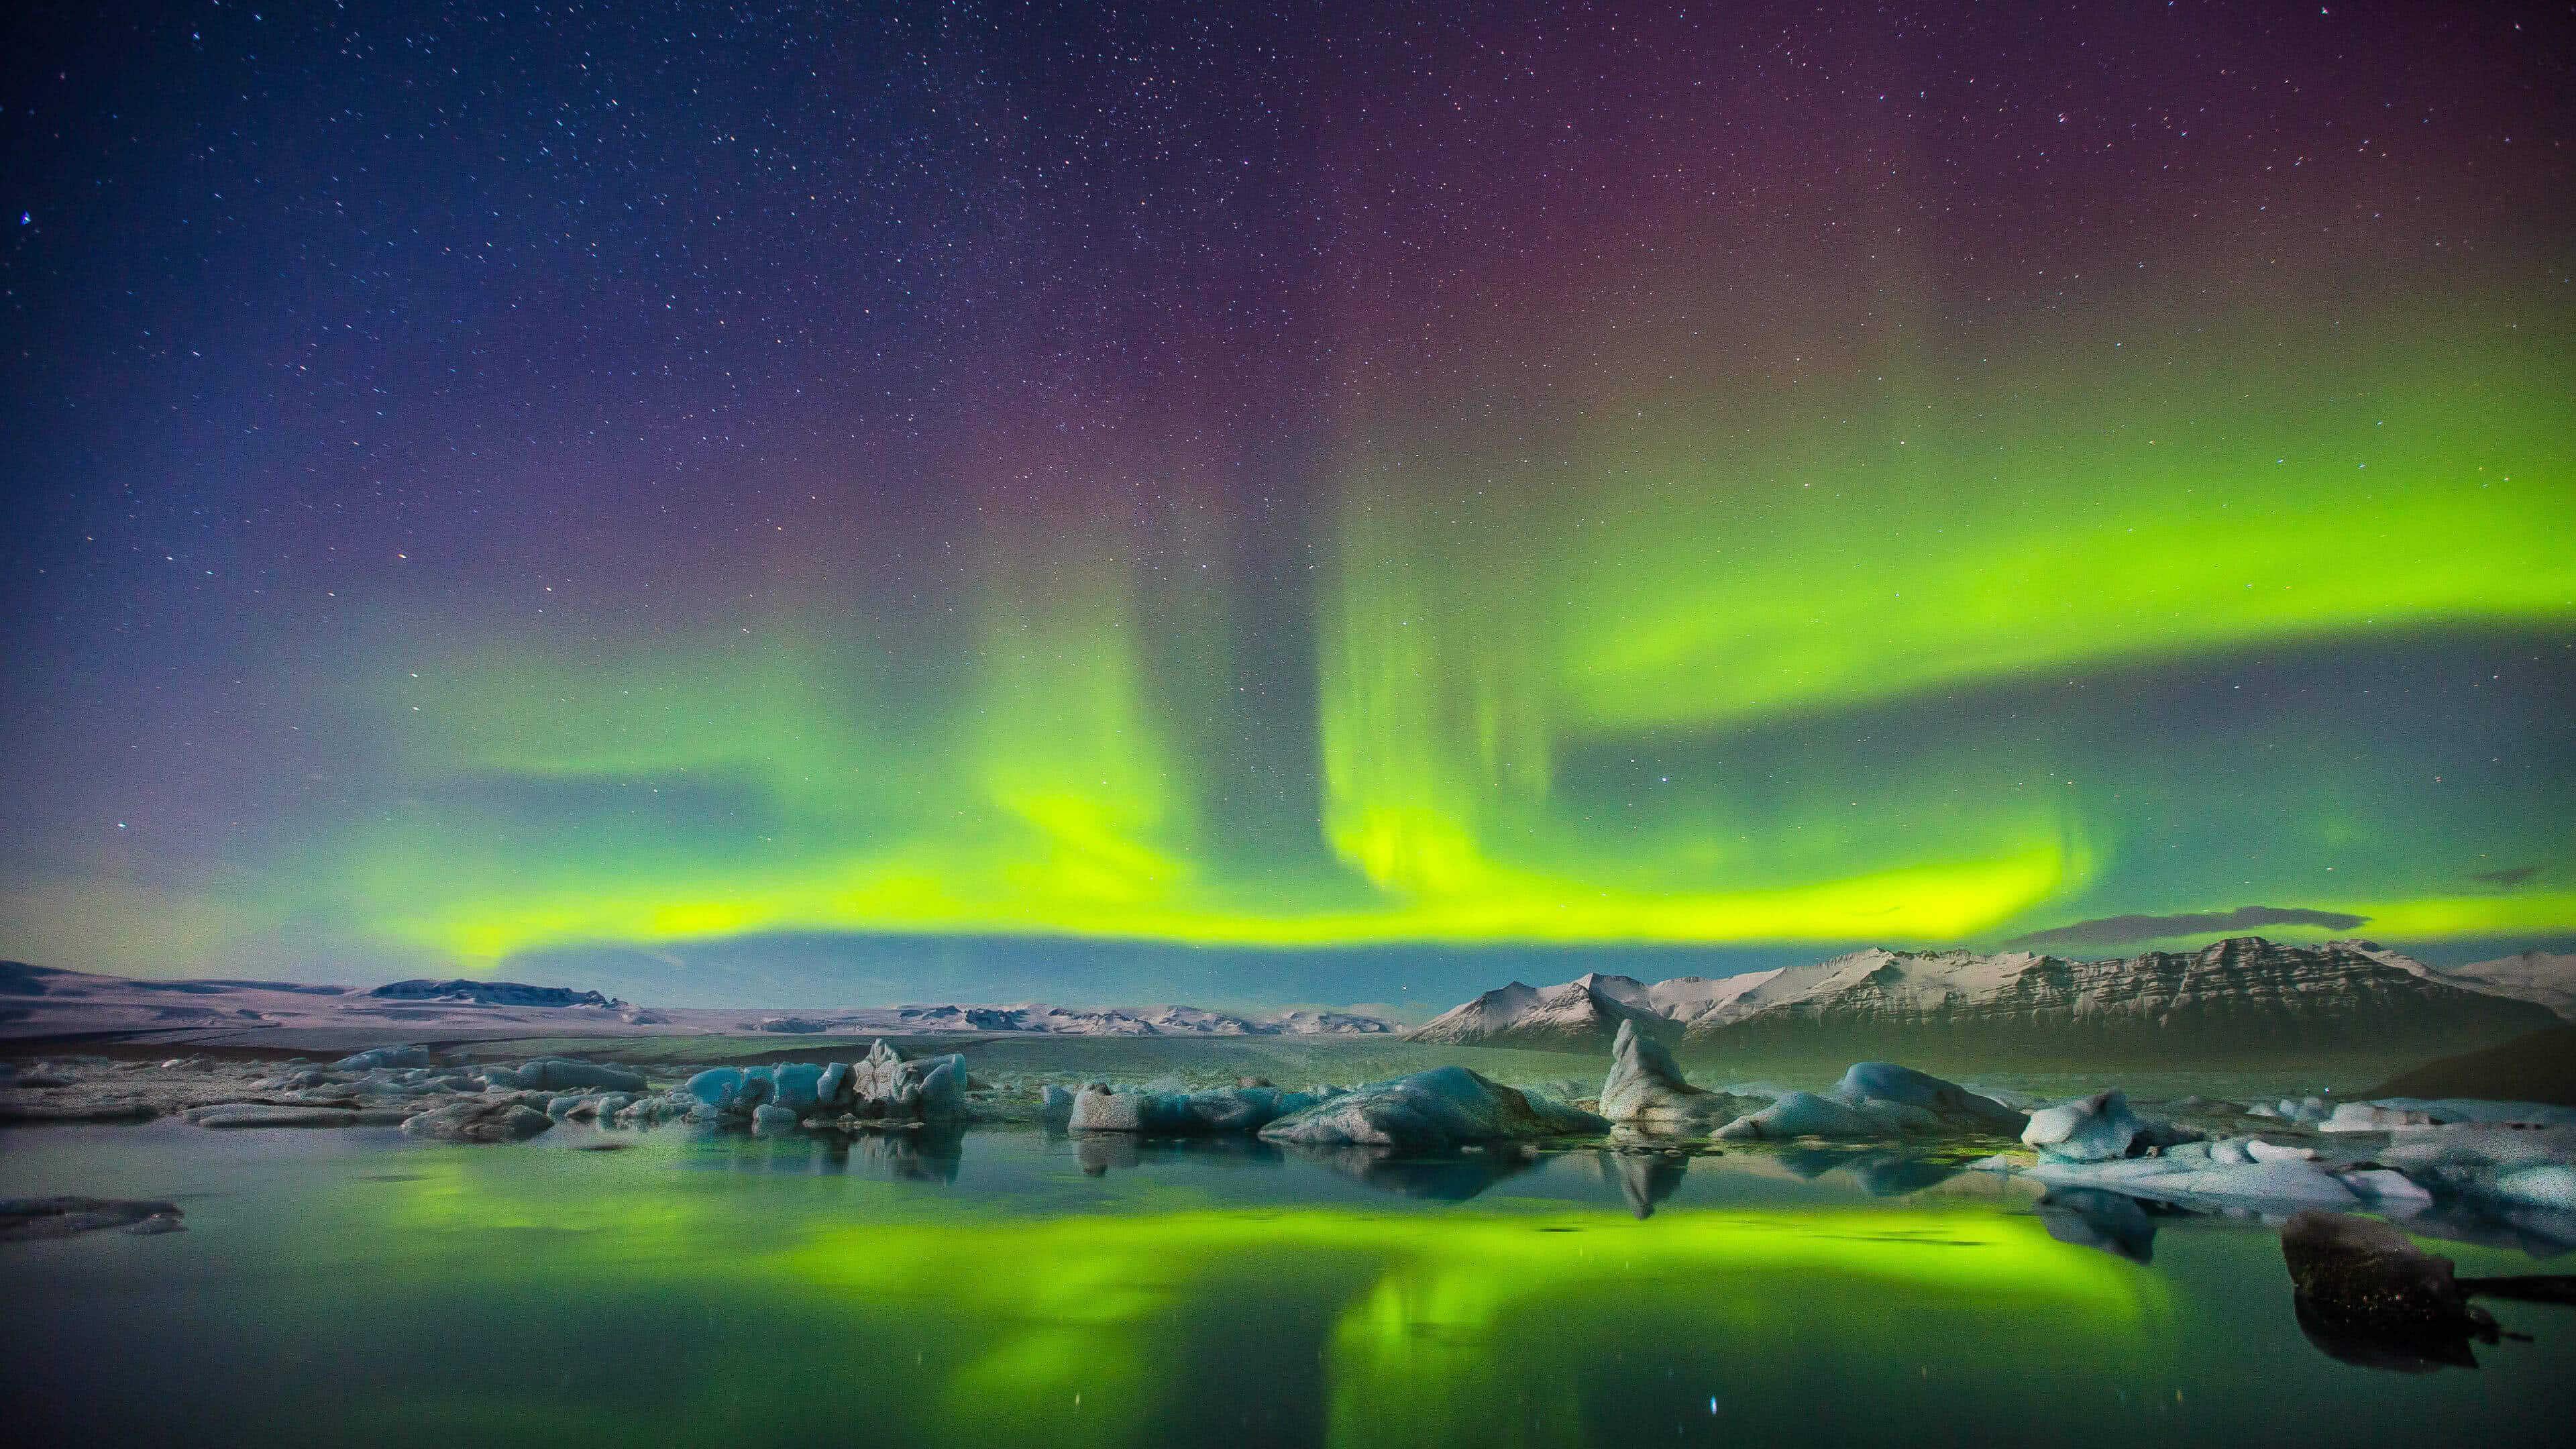 Www Hd Wallpaper Com Nature Aurora Borealis Northern Lights Uhd 4k Wallpaper Pixelz